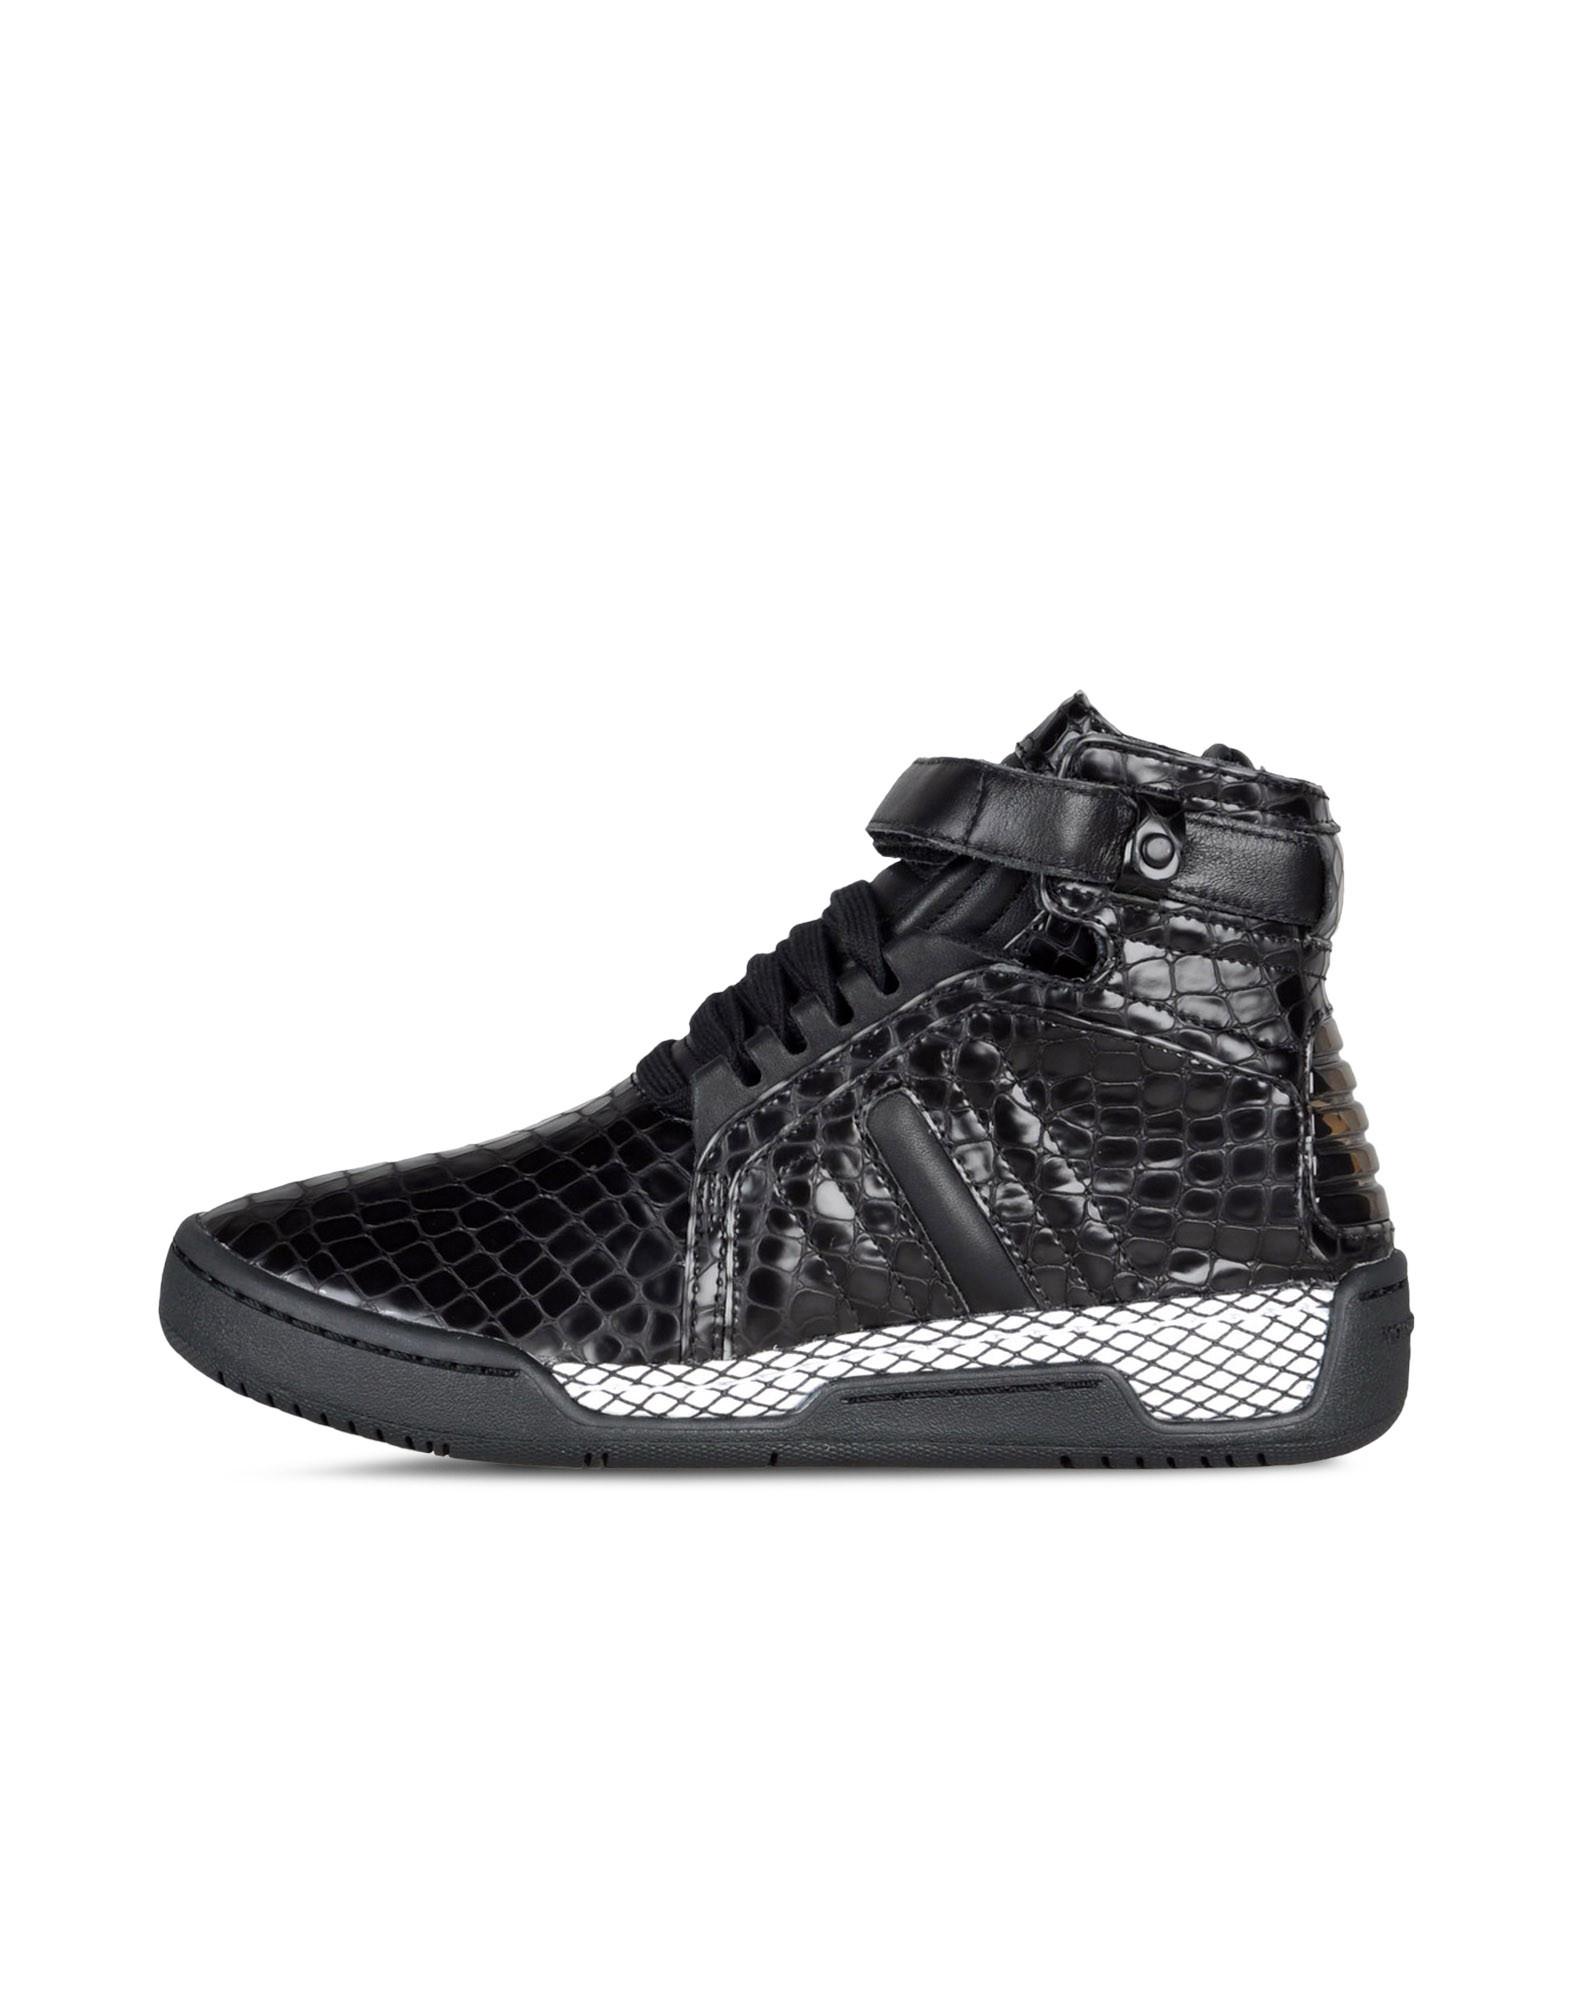 ... Y-3 Y-3 Hayworth 2 Mid High-top sneakers Woman ... 998ec7ffba51